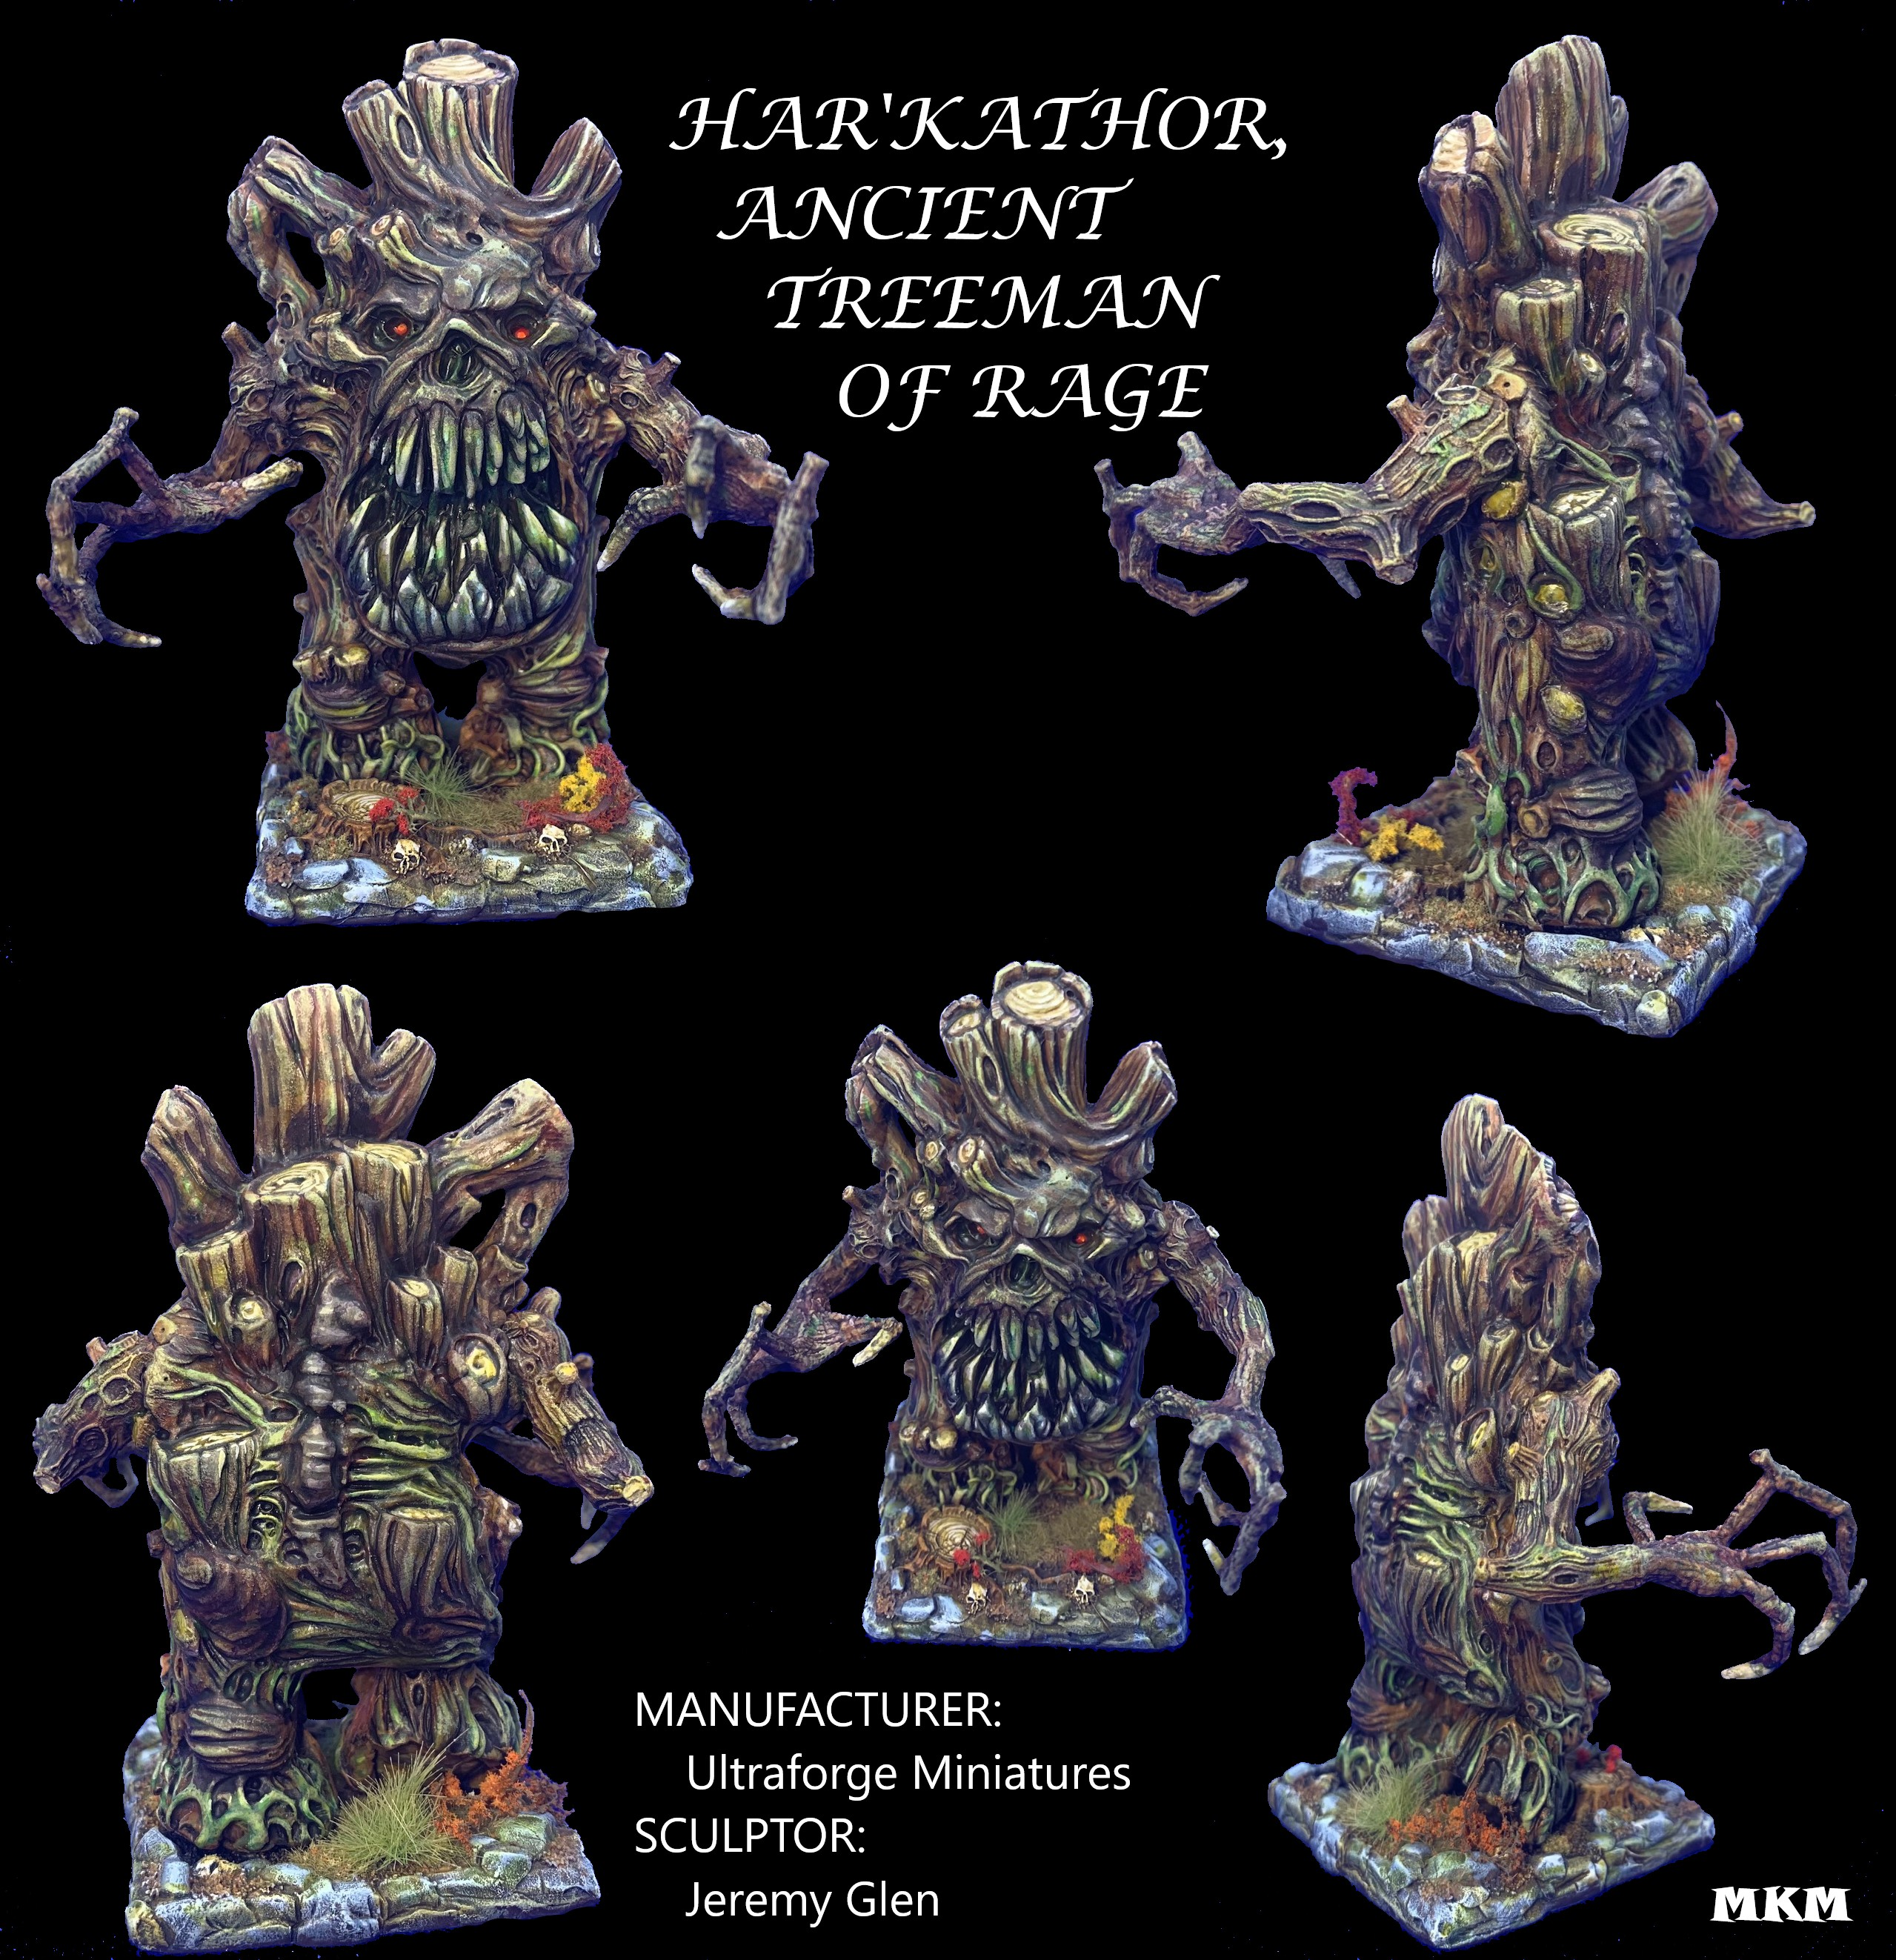 HAR'KATHOR, Treeman of Rage